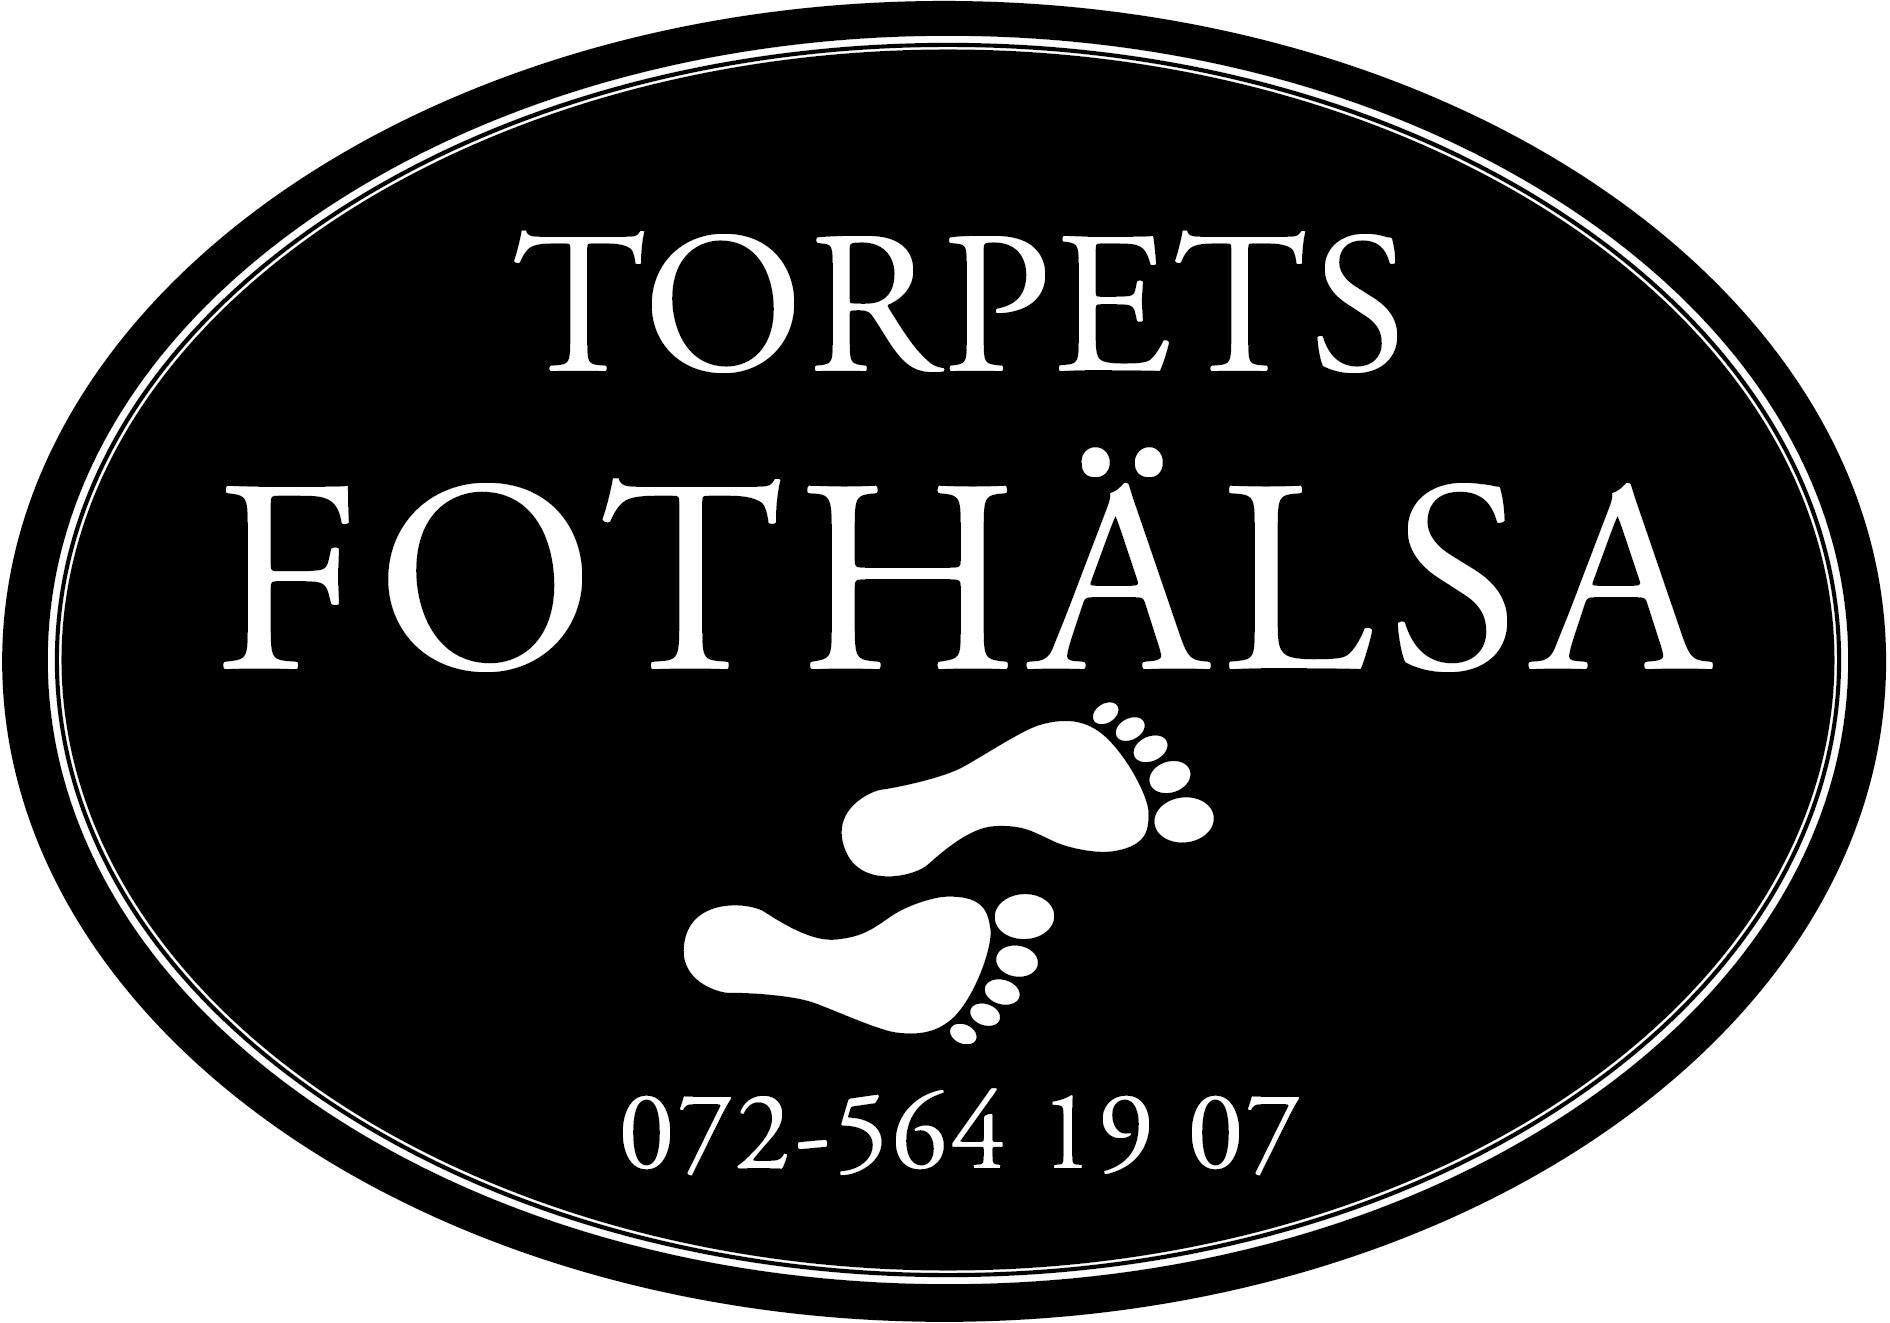 torpets_fothalsa